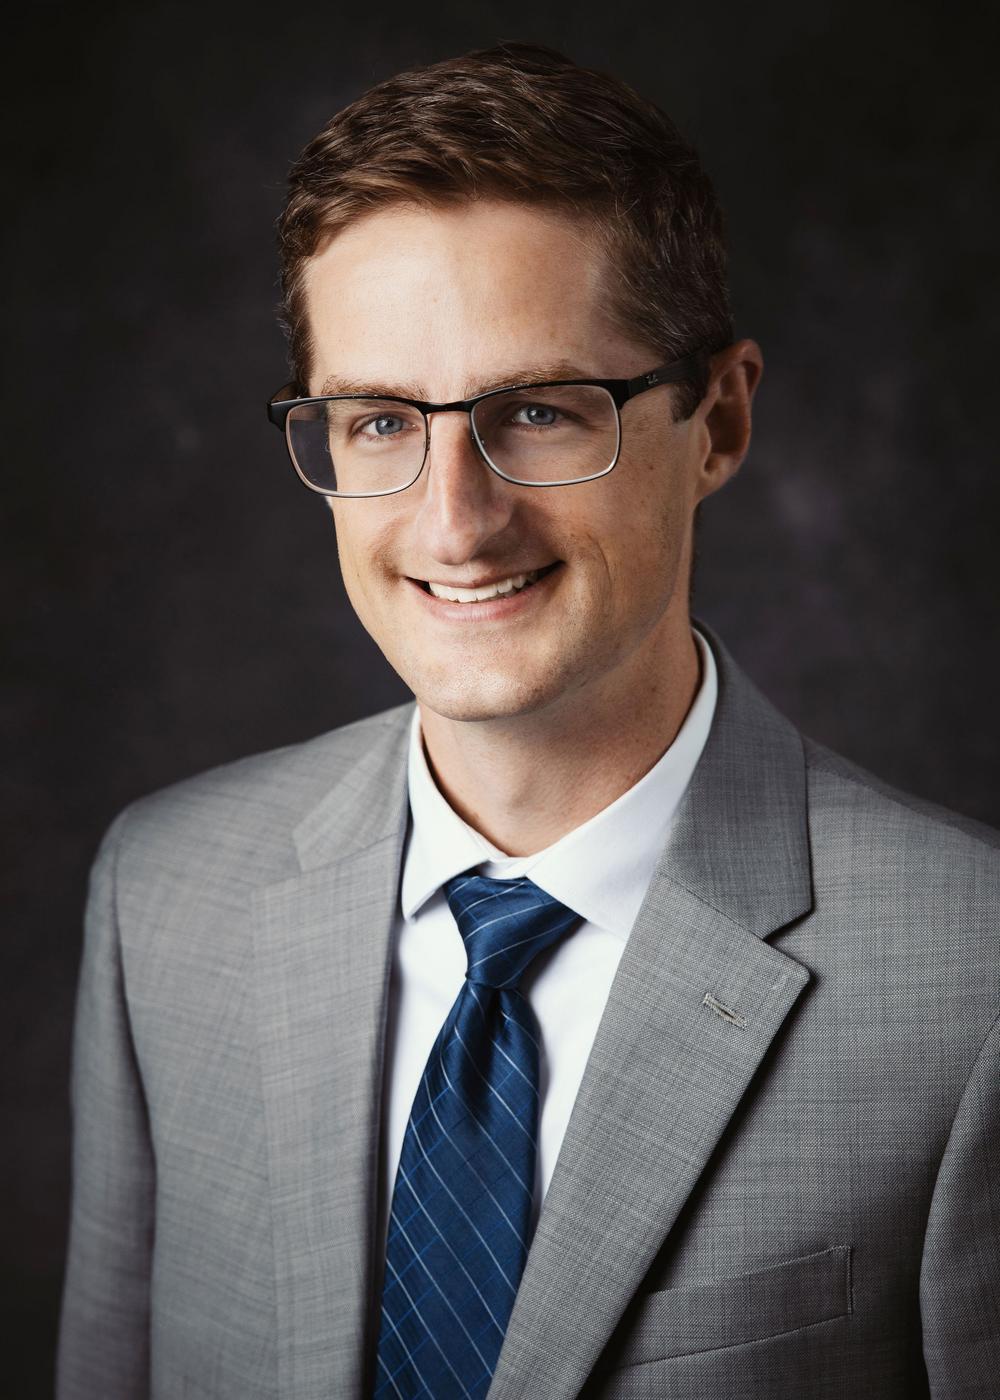 Joseph Q. Manley, CFP® Photo